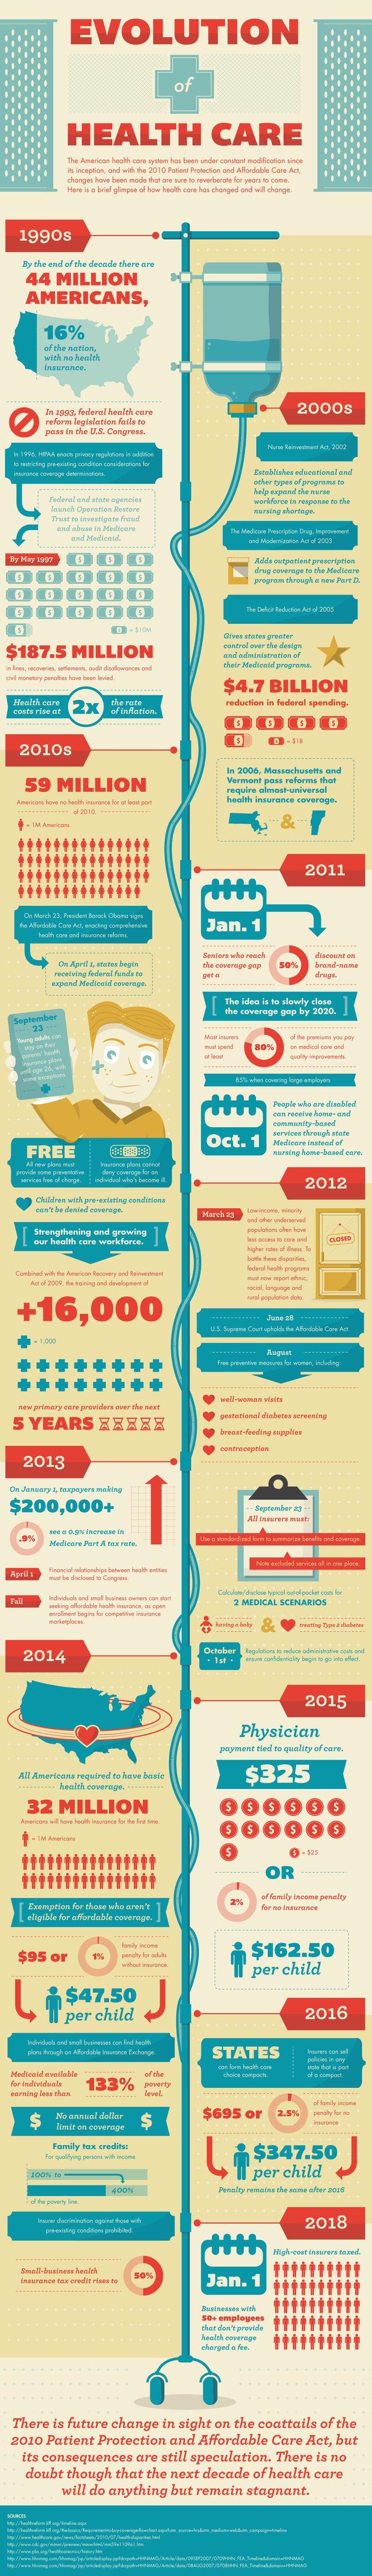 Compare contrast essay internet books